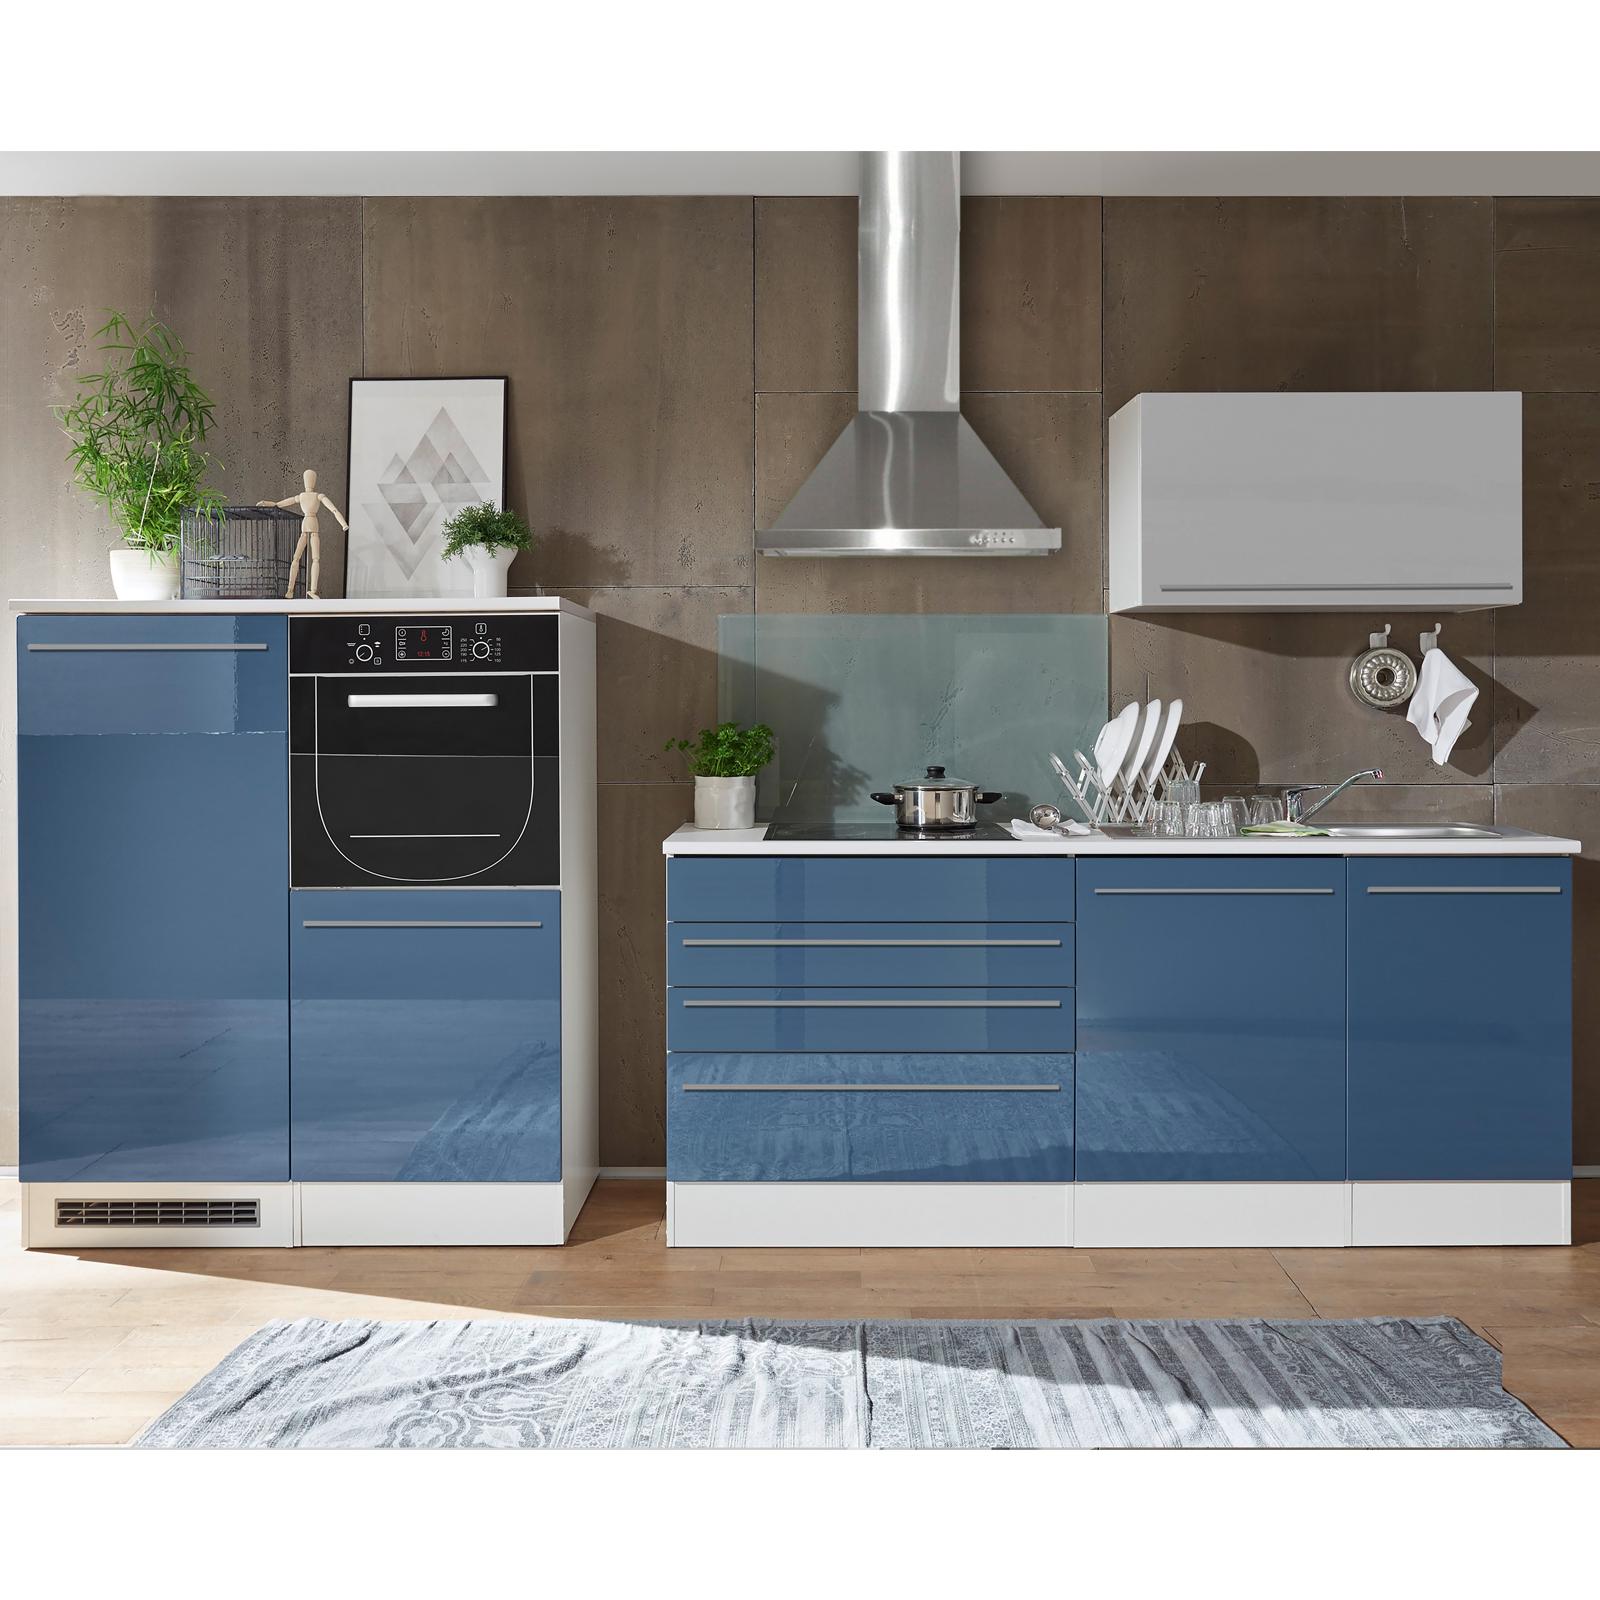 Kuchenblock Blau Hochglanz Weiss Matt 320 Cm Online Bei Roller Kaufen